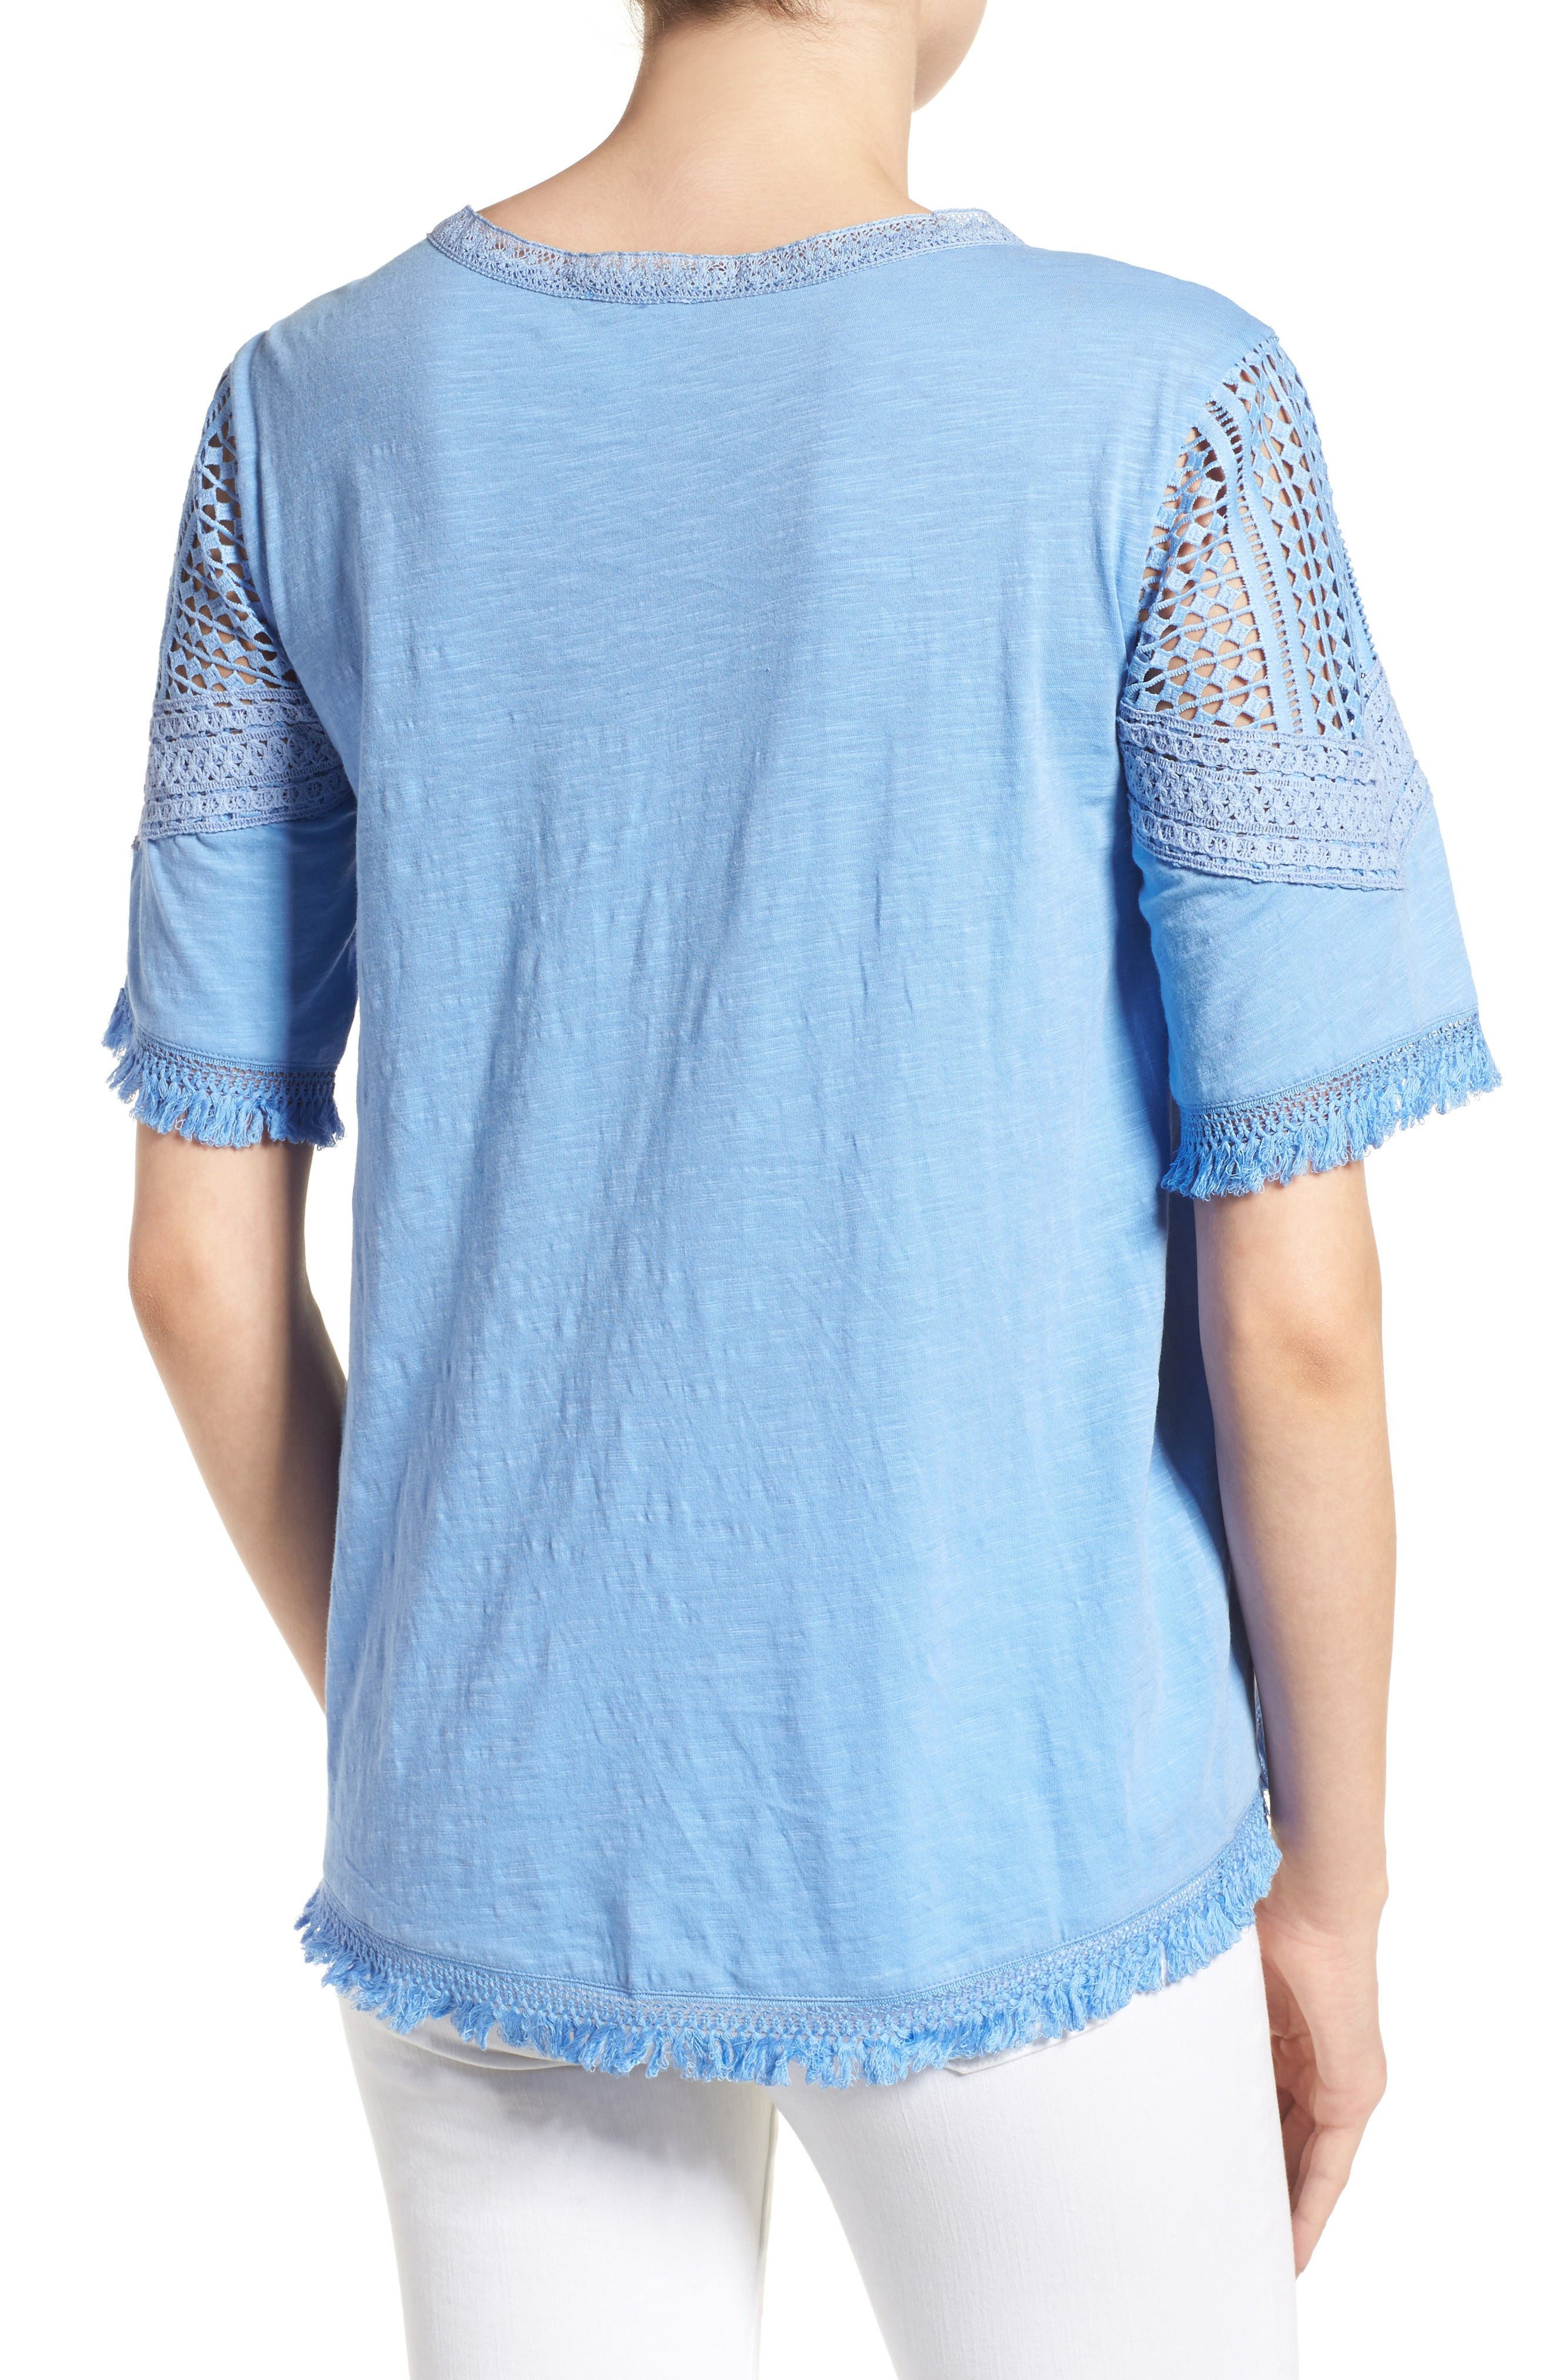 Alternate Image 2  - Caslon® Fringed Lace & Knit Tee (Regular & Petite)